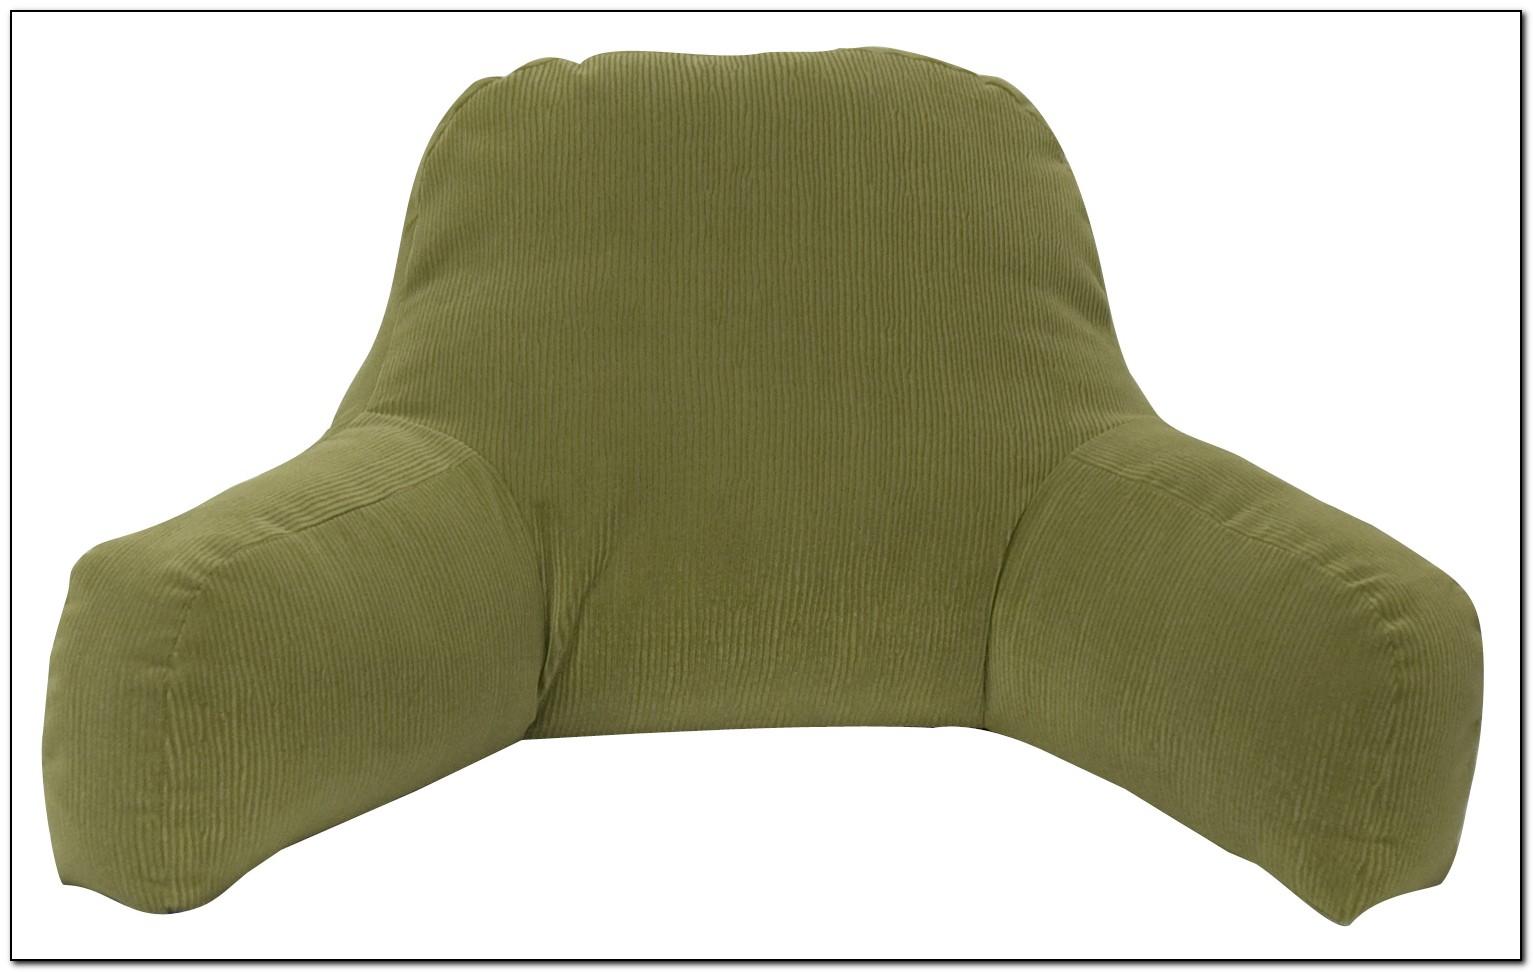 Best Bed For Back Pain Dr Oz